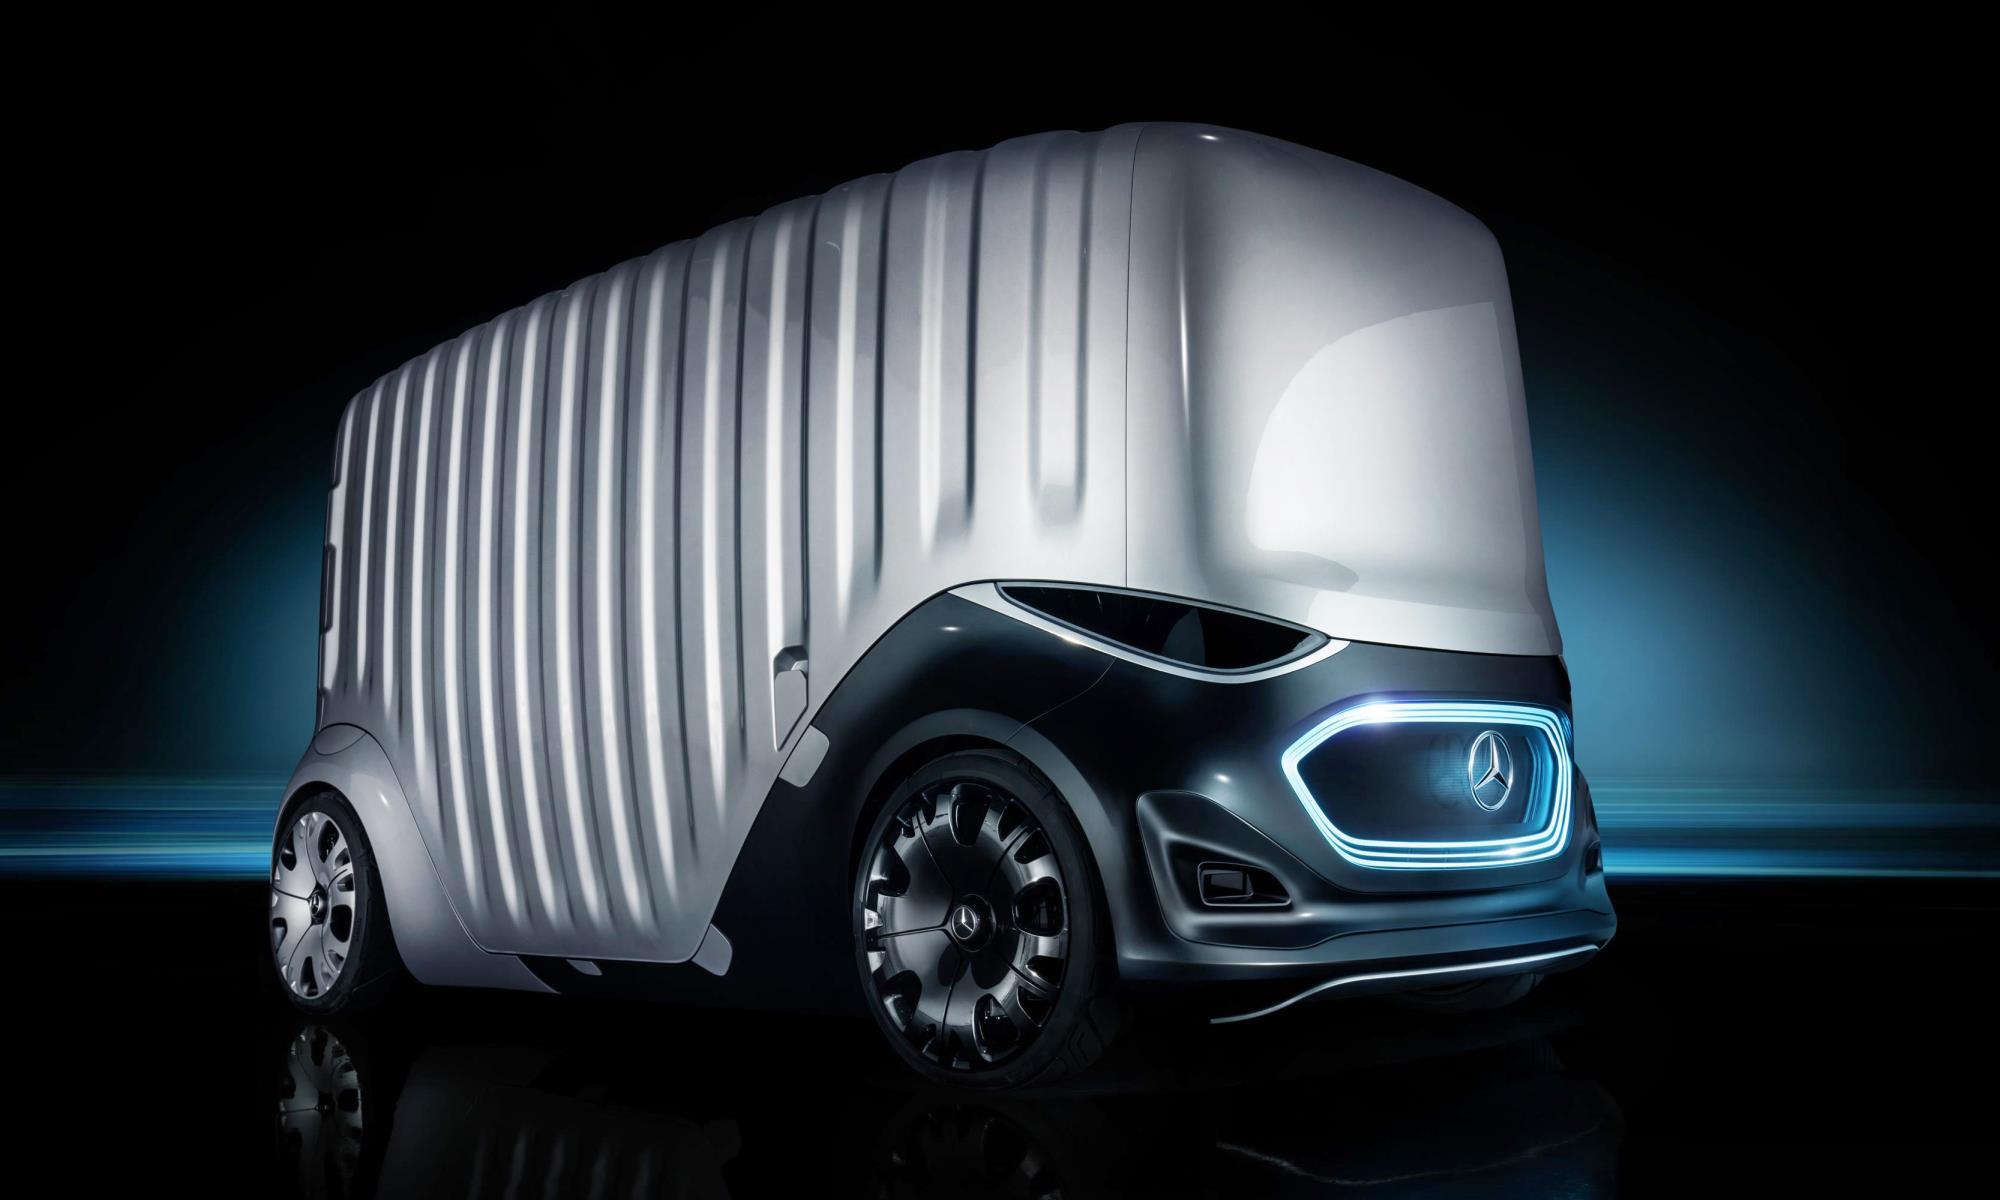 Mercedes-Benz Vision Urbanetic cargo van